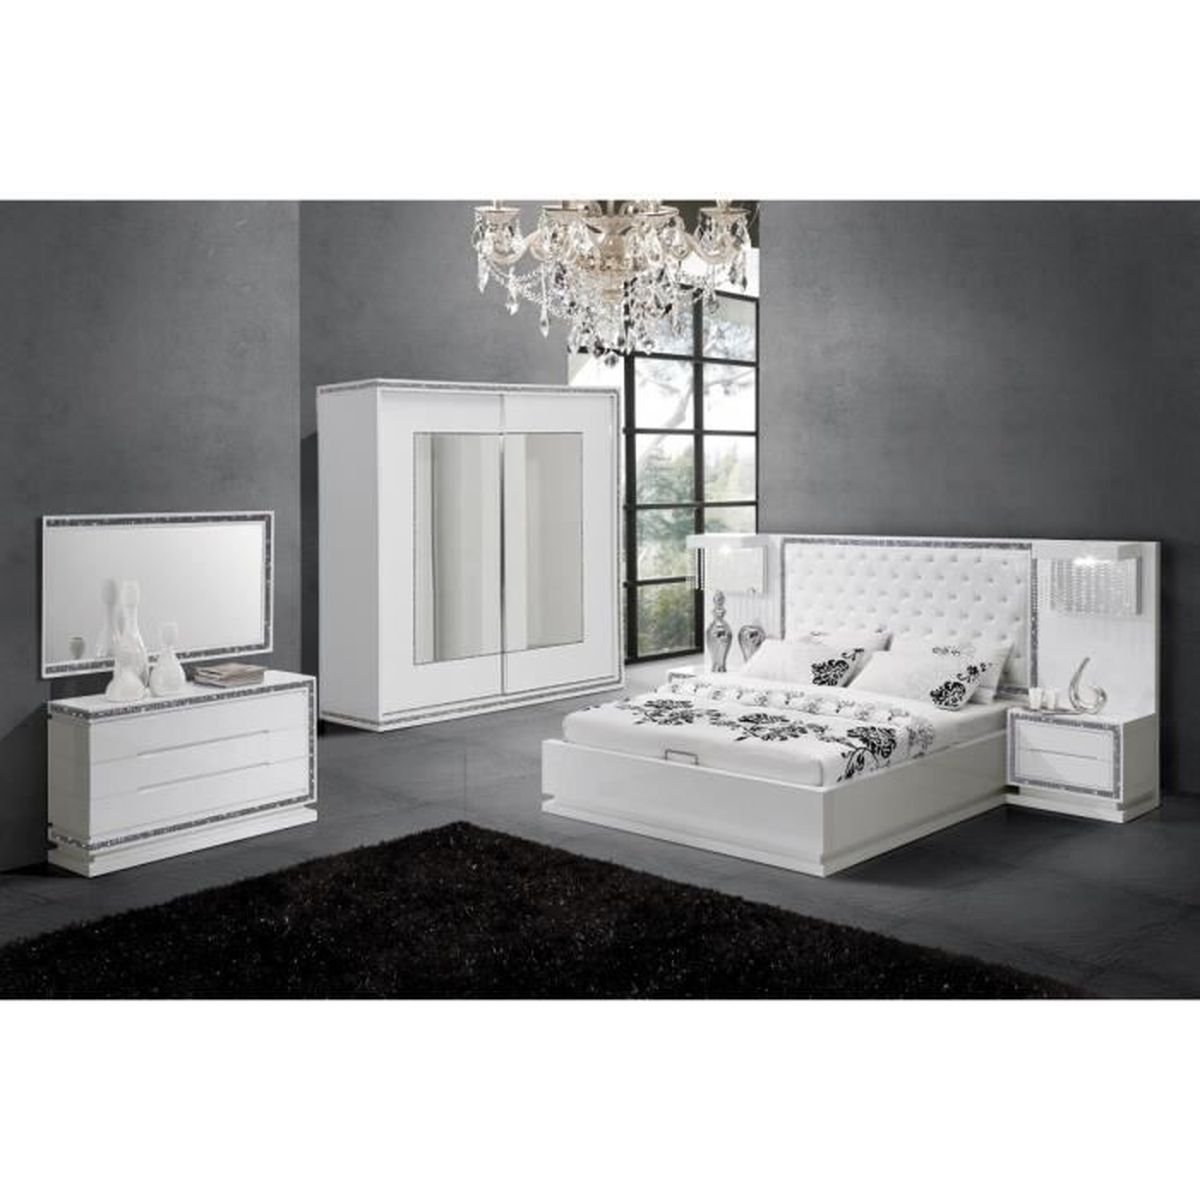 Inspiring Meuble De Chambre Blanc Lustré